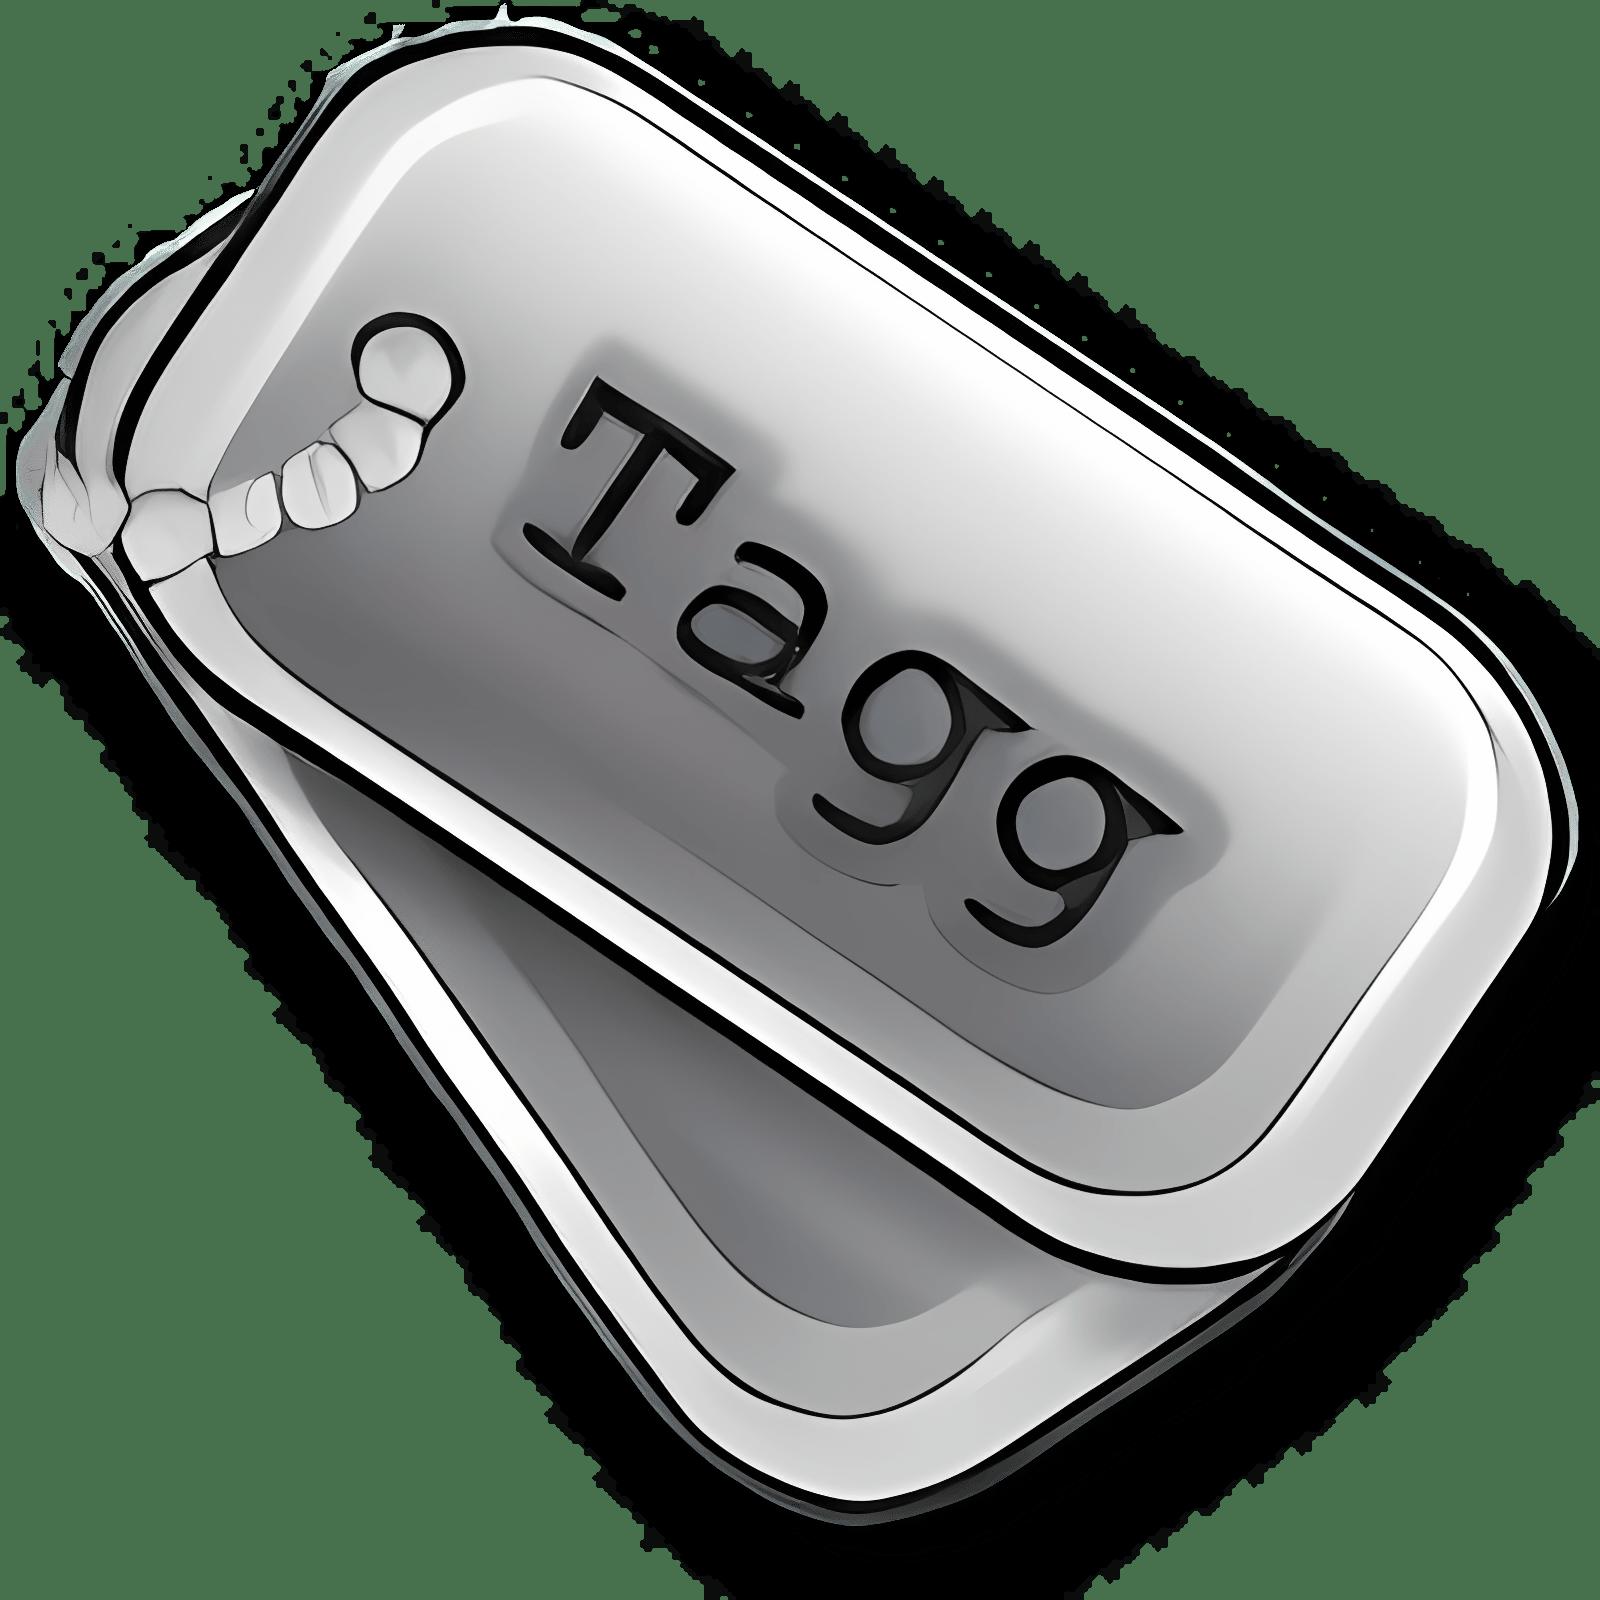 Tagg 2.1.2